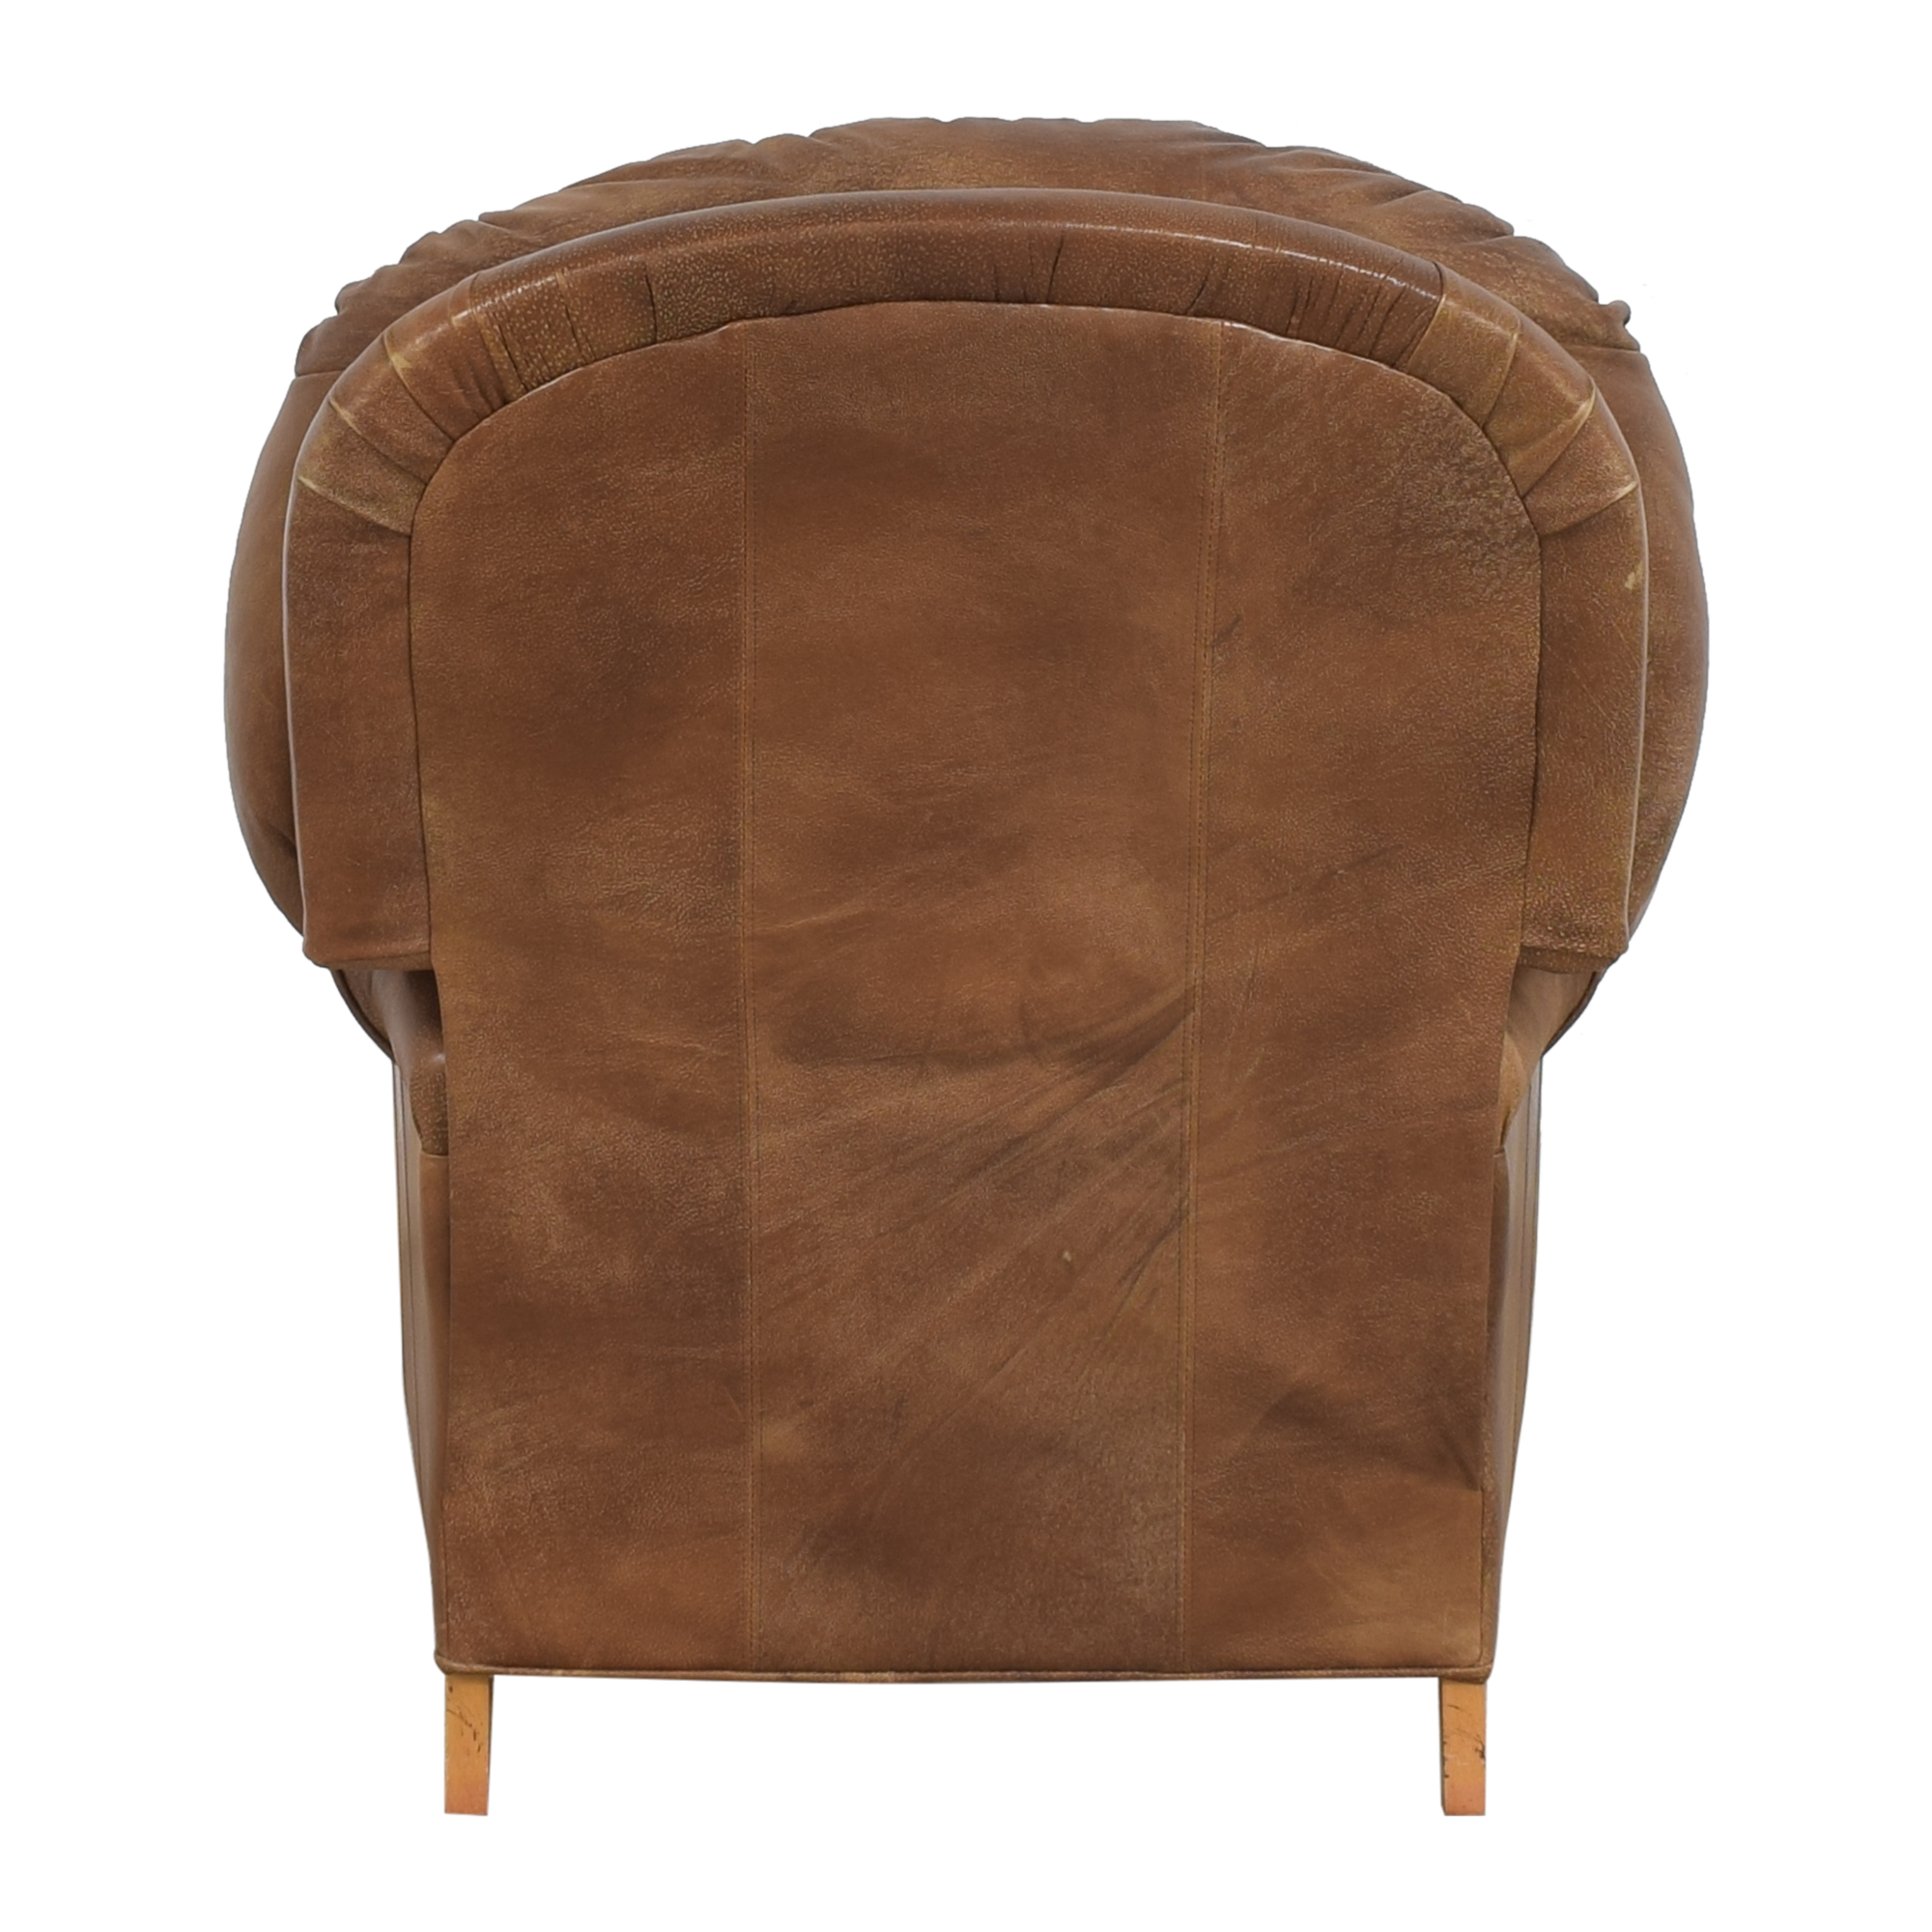 Thomasville Thomasville Leather Morgan Recliner nyc